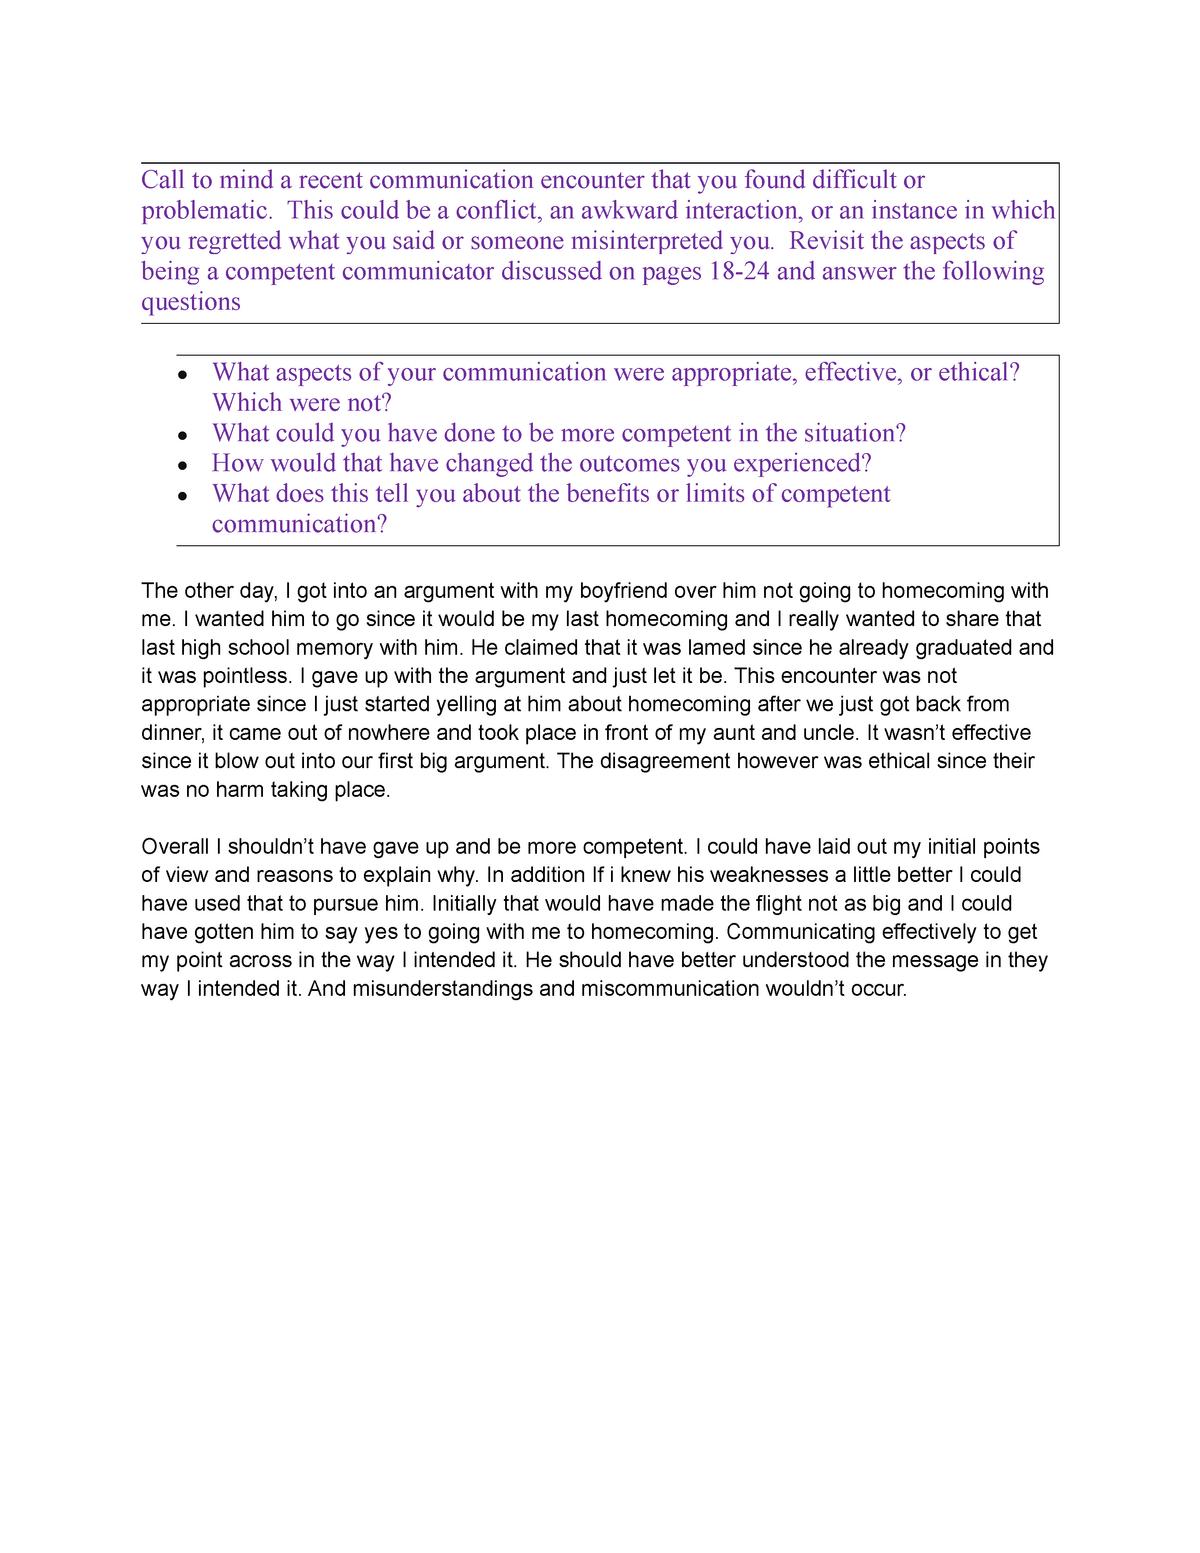 Chapter 1Activity - Mandatory Assignment - SPC 1017